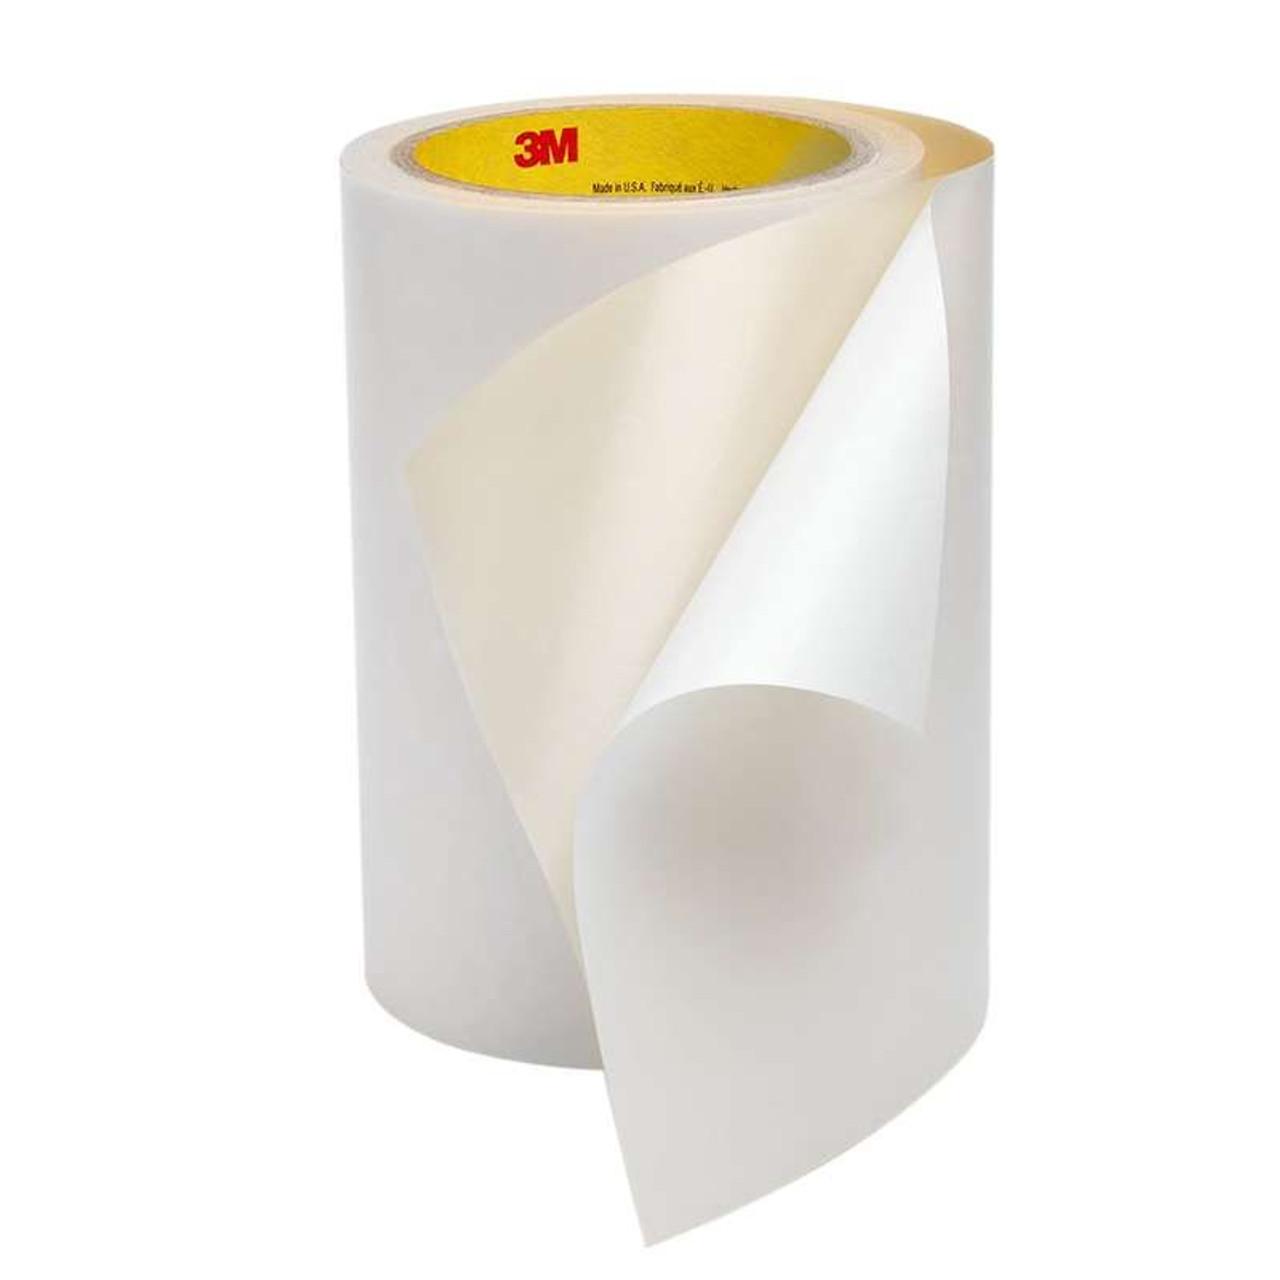 3M™ Thermal Bonding Film 406, 50.18 in x 36 yds x 3.0 mil, untrimmed